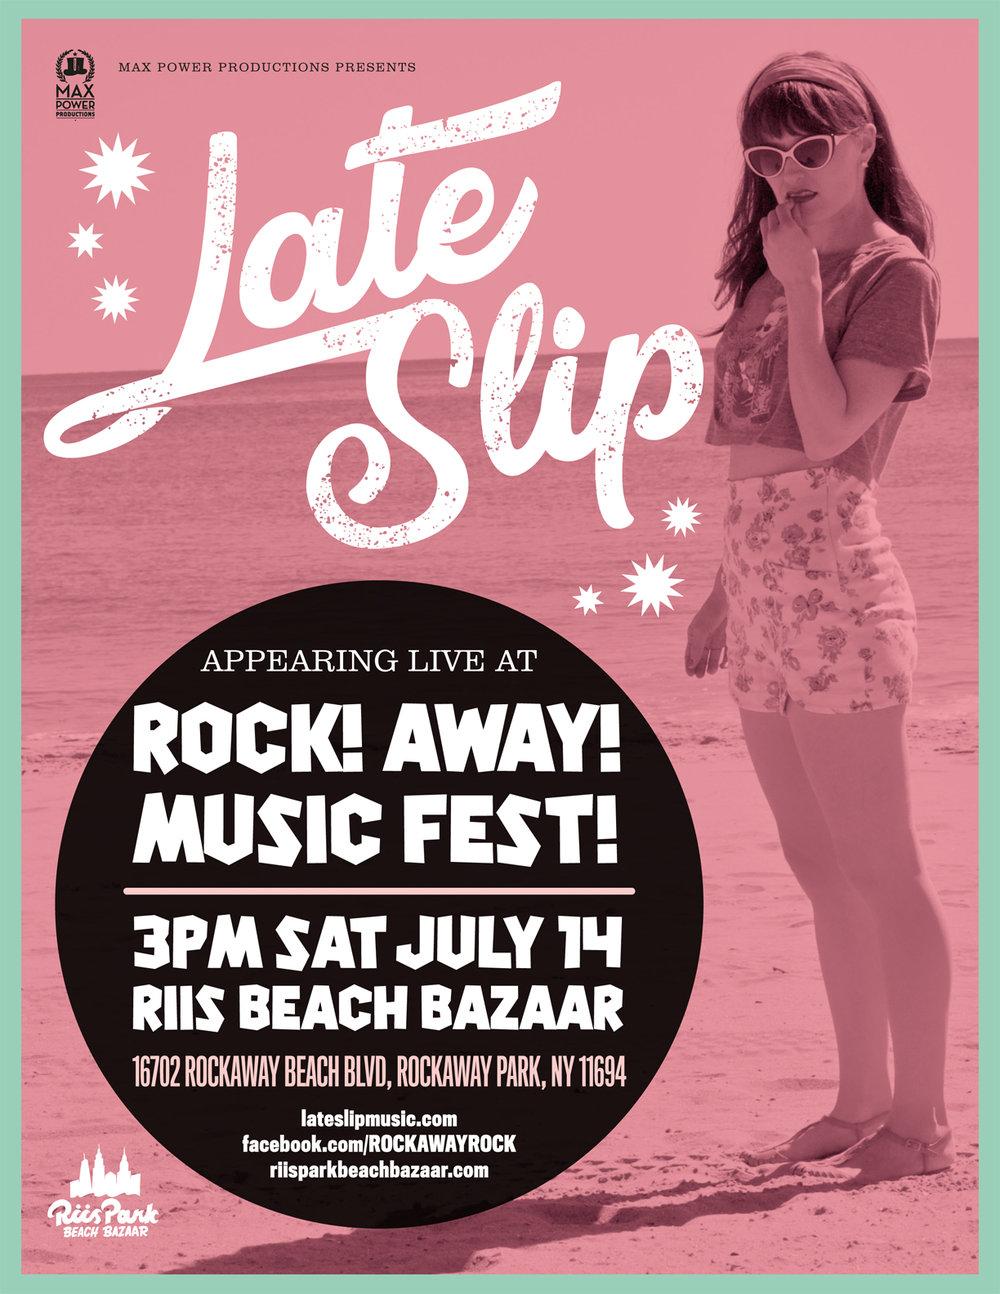 Late Slip Poster Rockaway Festival.jpg